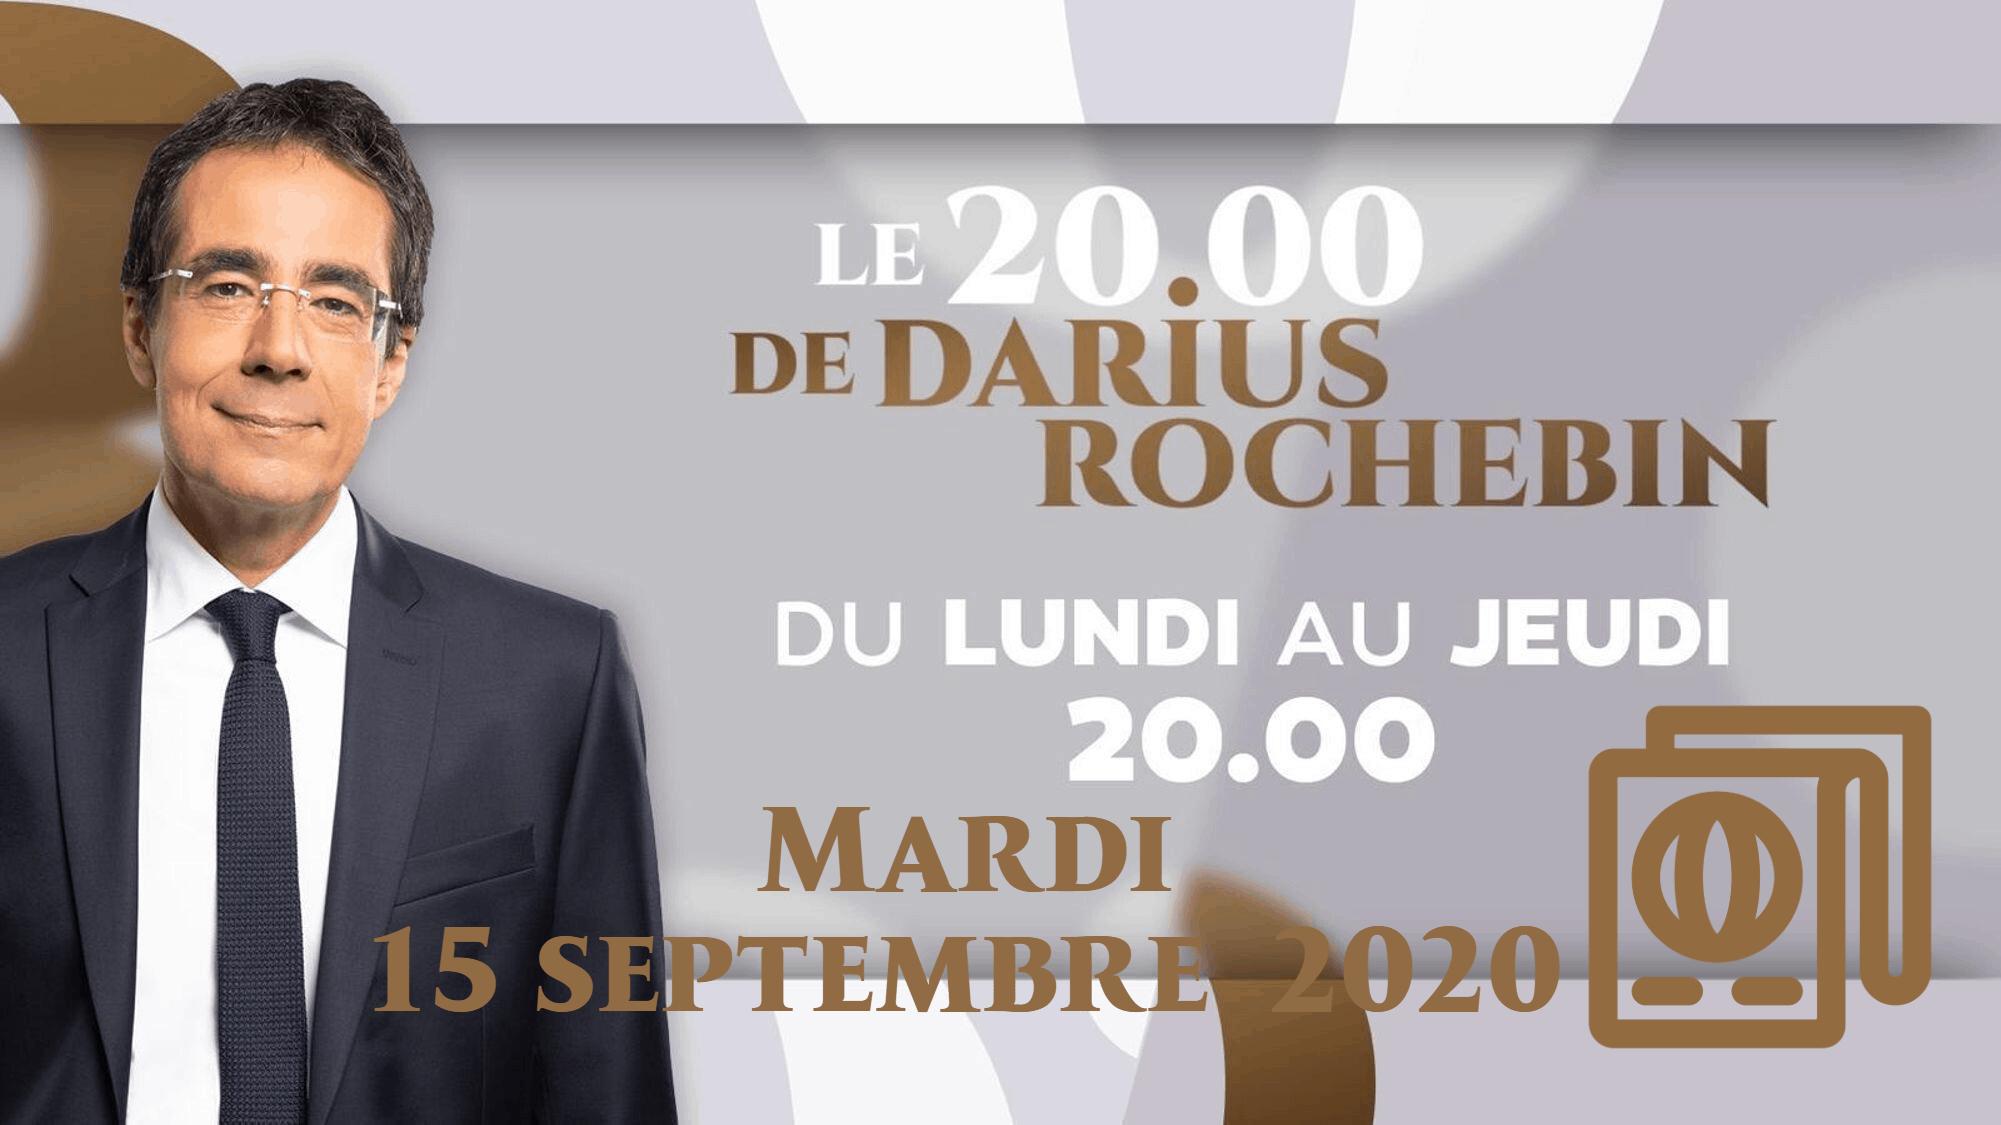 20h DARIUS ROCHEBIN mardi 15 septembre 2020